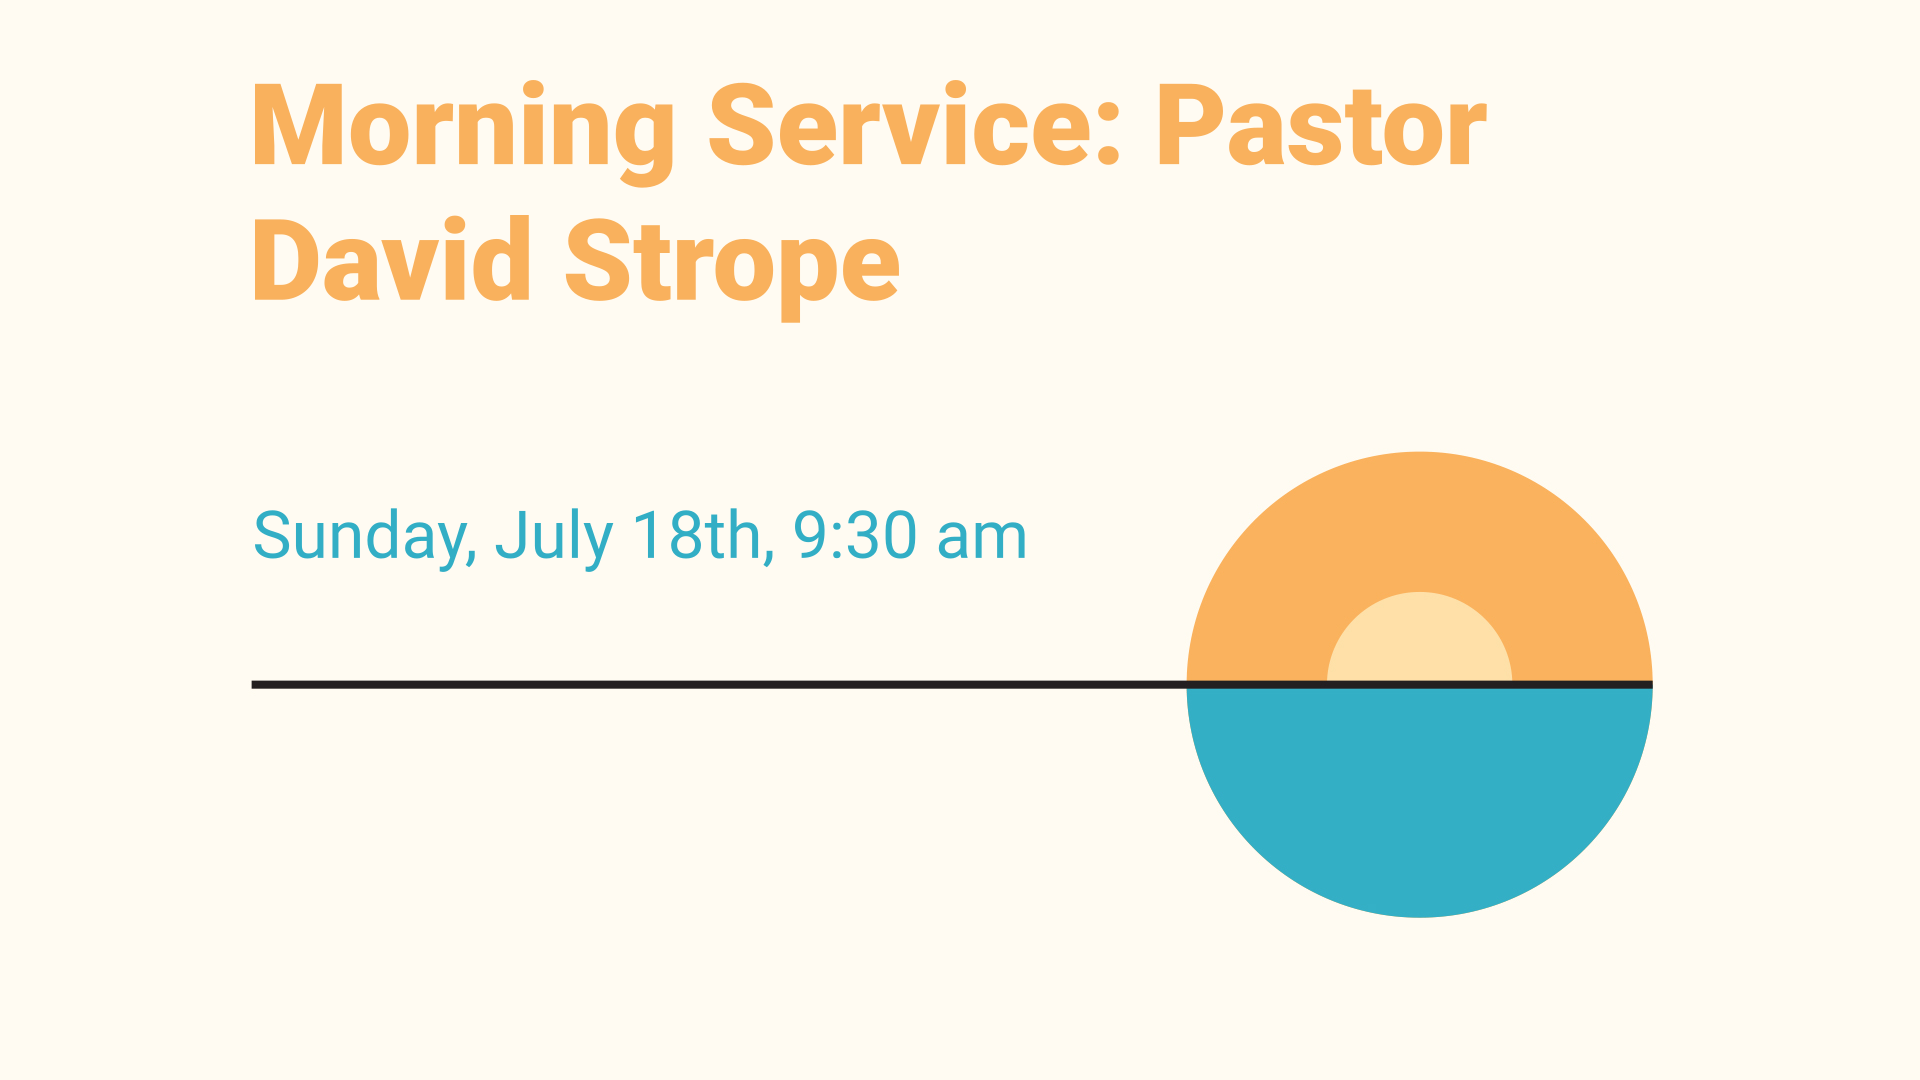 Morning Service: Pastor David Strope